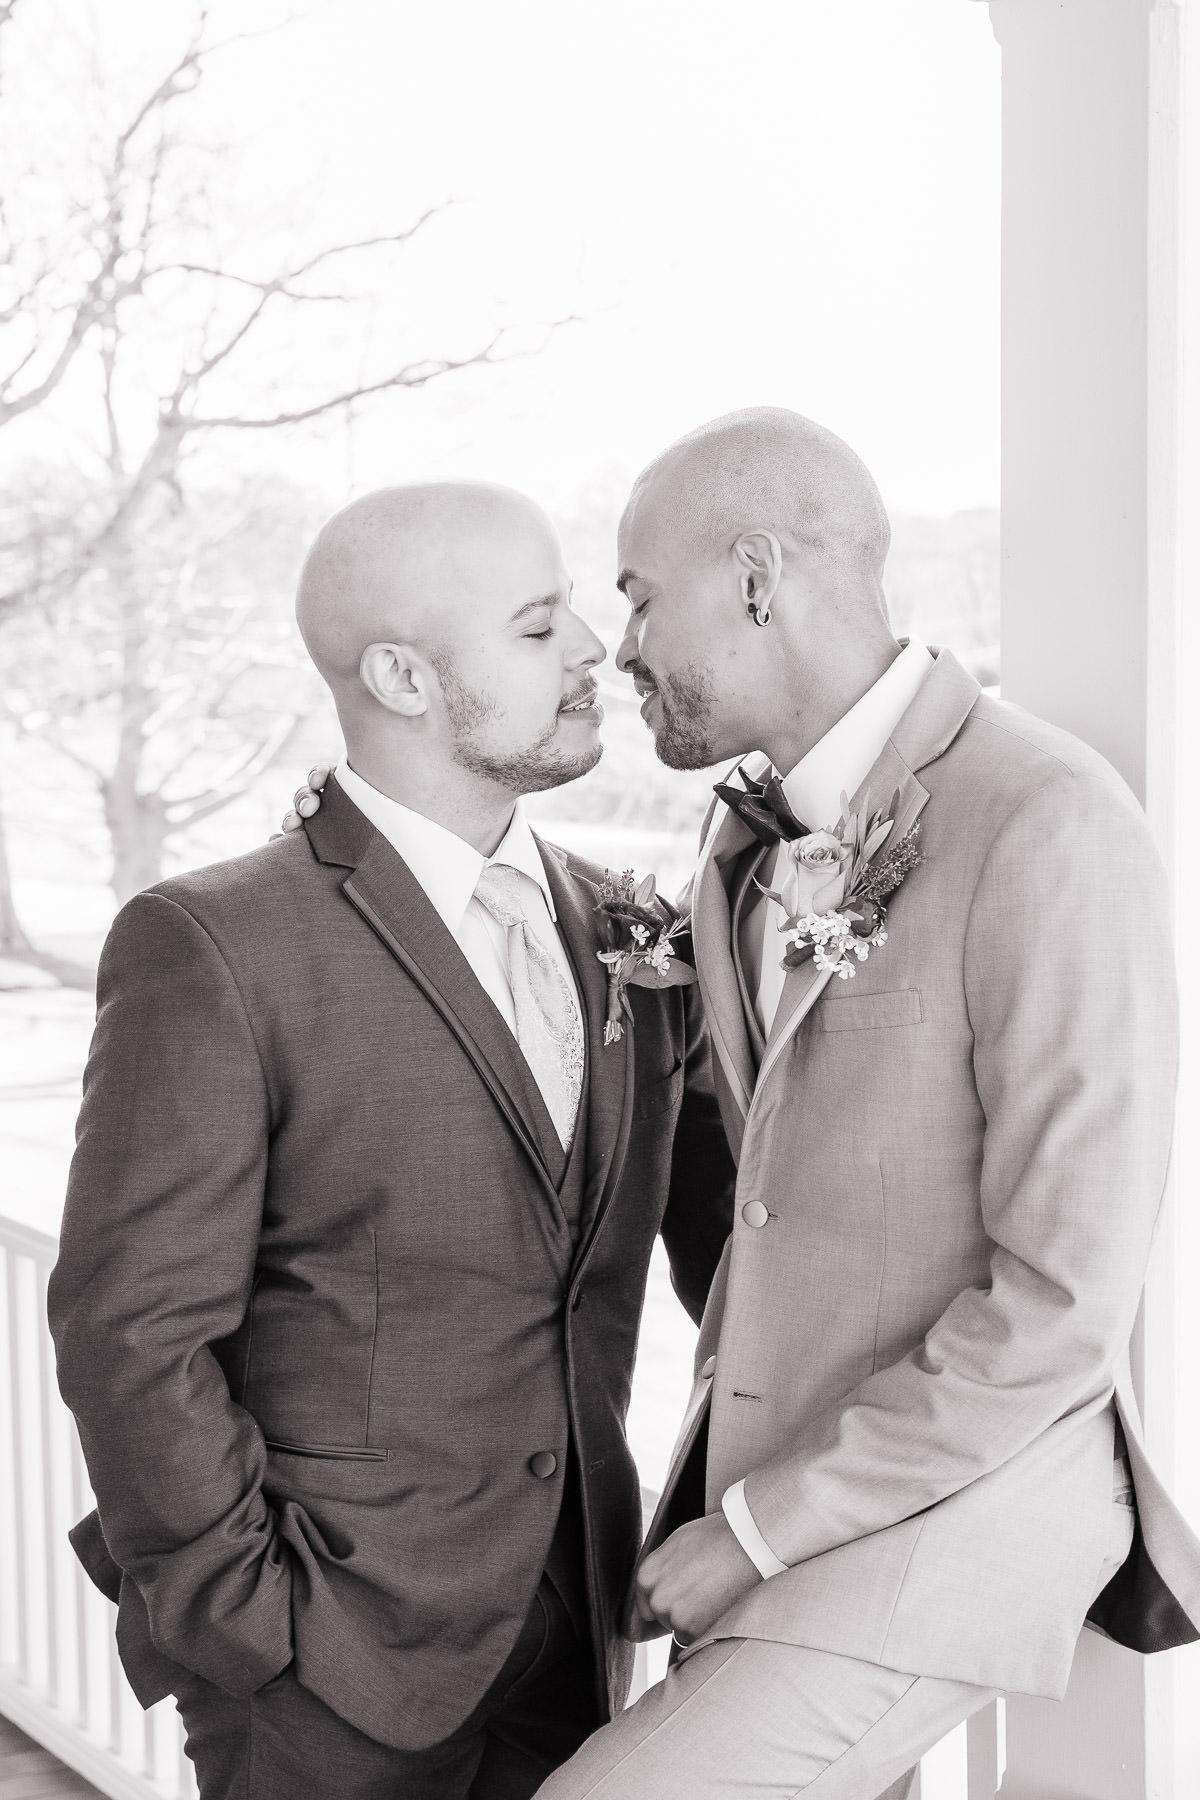 Eisenhower House, Newport, Rhode Island, Tracy Jenkins Photography, wedding, LGBTQ+, LGBT, Gay, Inclusive, Photography, Wedding photography, couple, groom, grooms